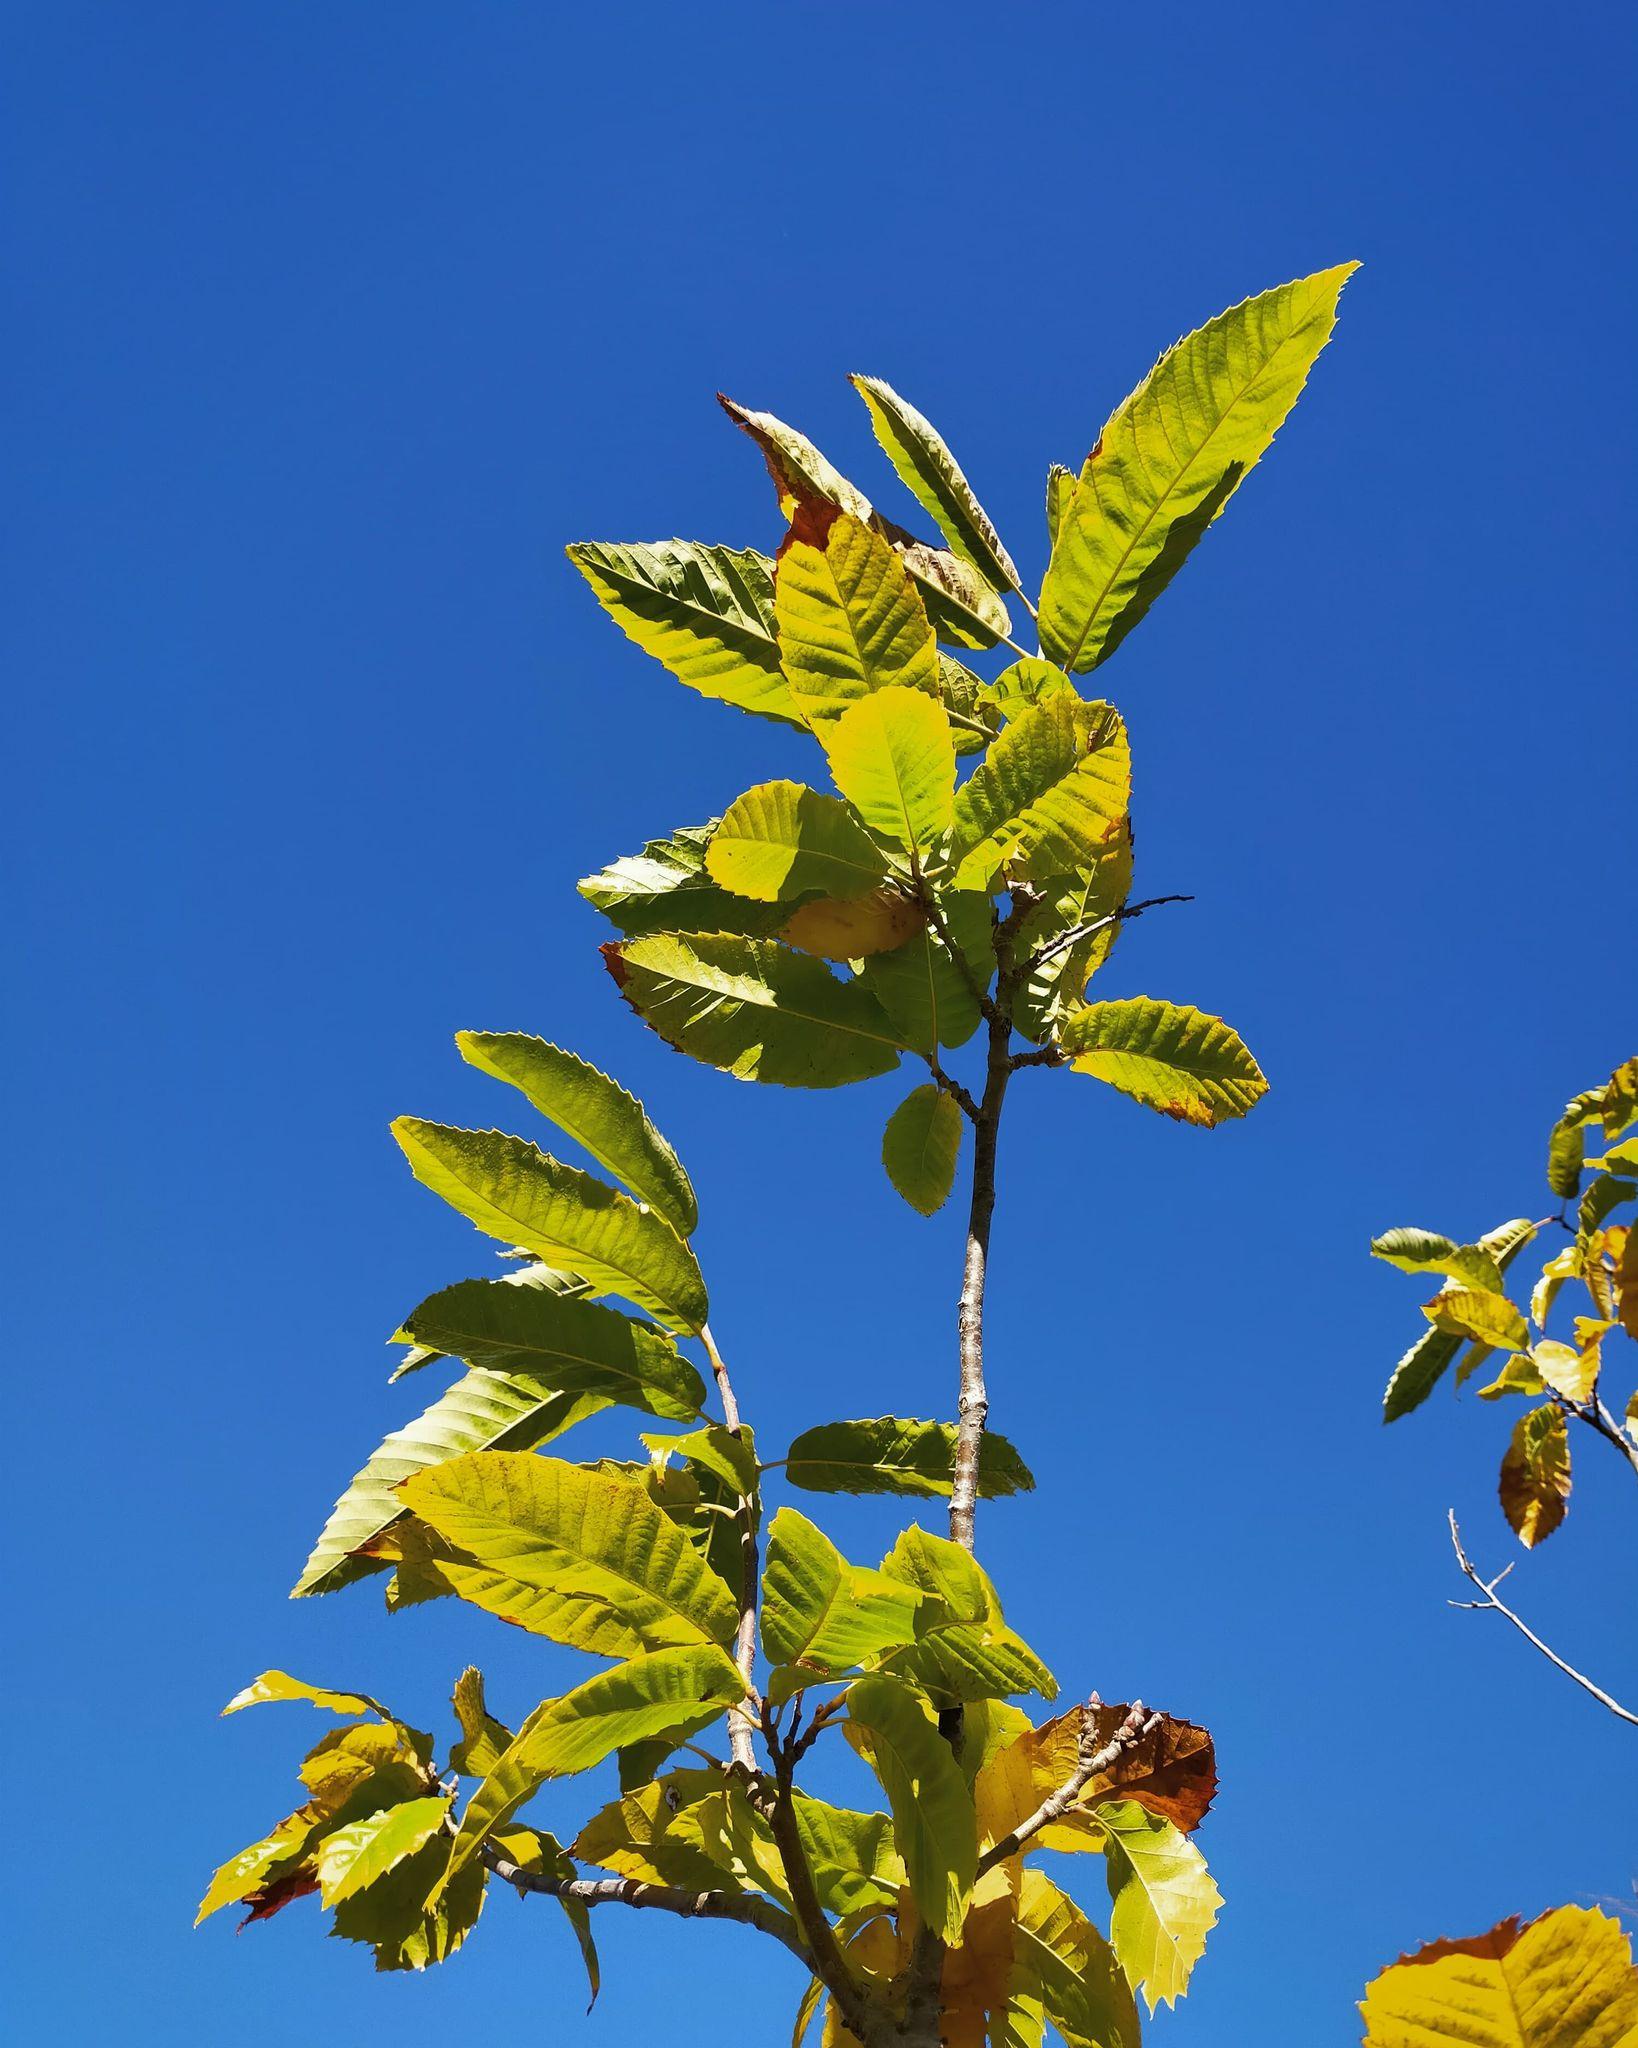 GC- Chataignier - castanea sativa - florac surba - automne 2020 - ciel bleu